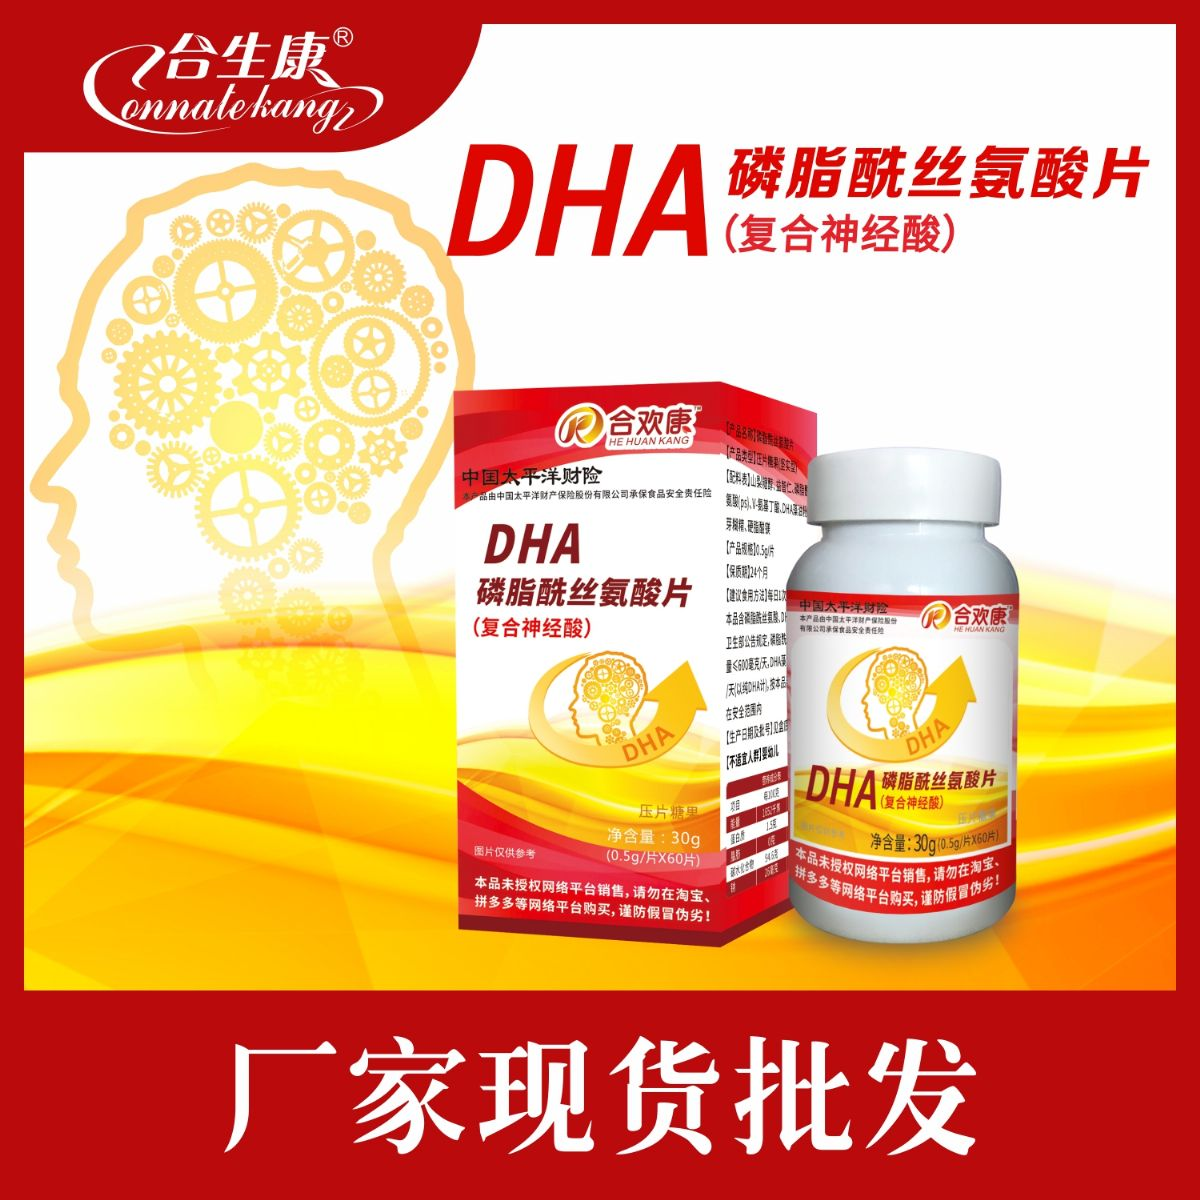 DHA復合神經酸精片